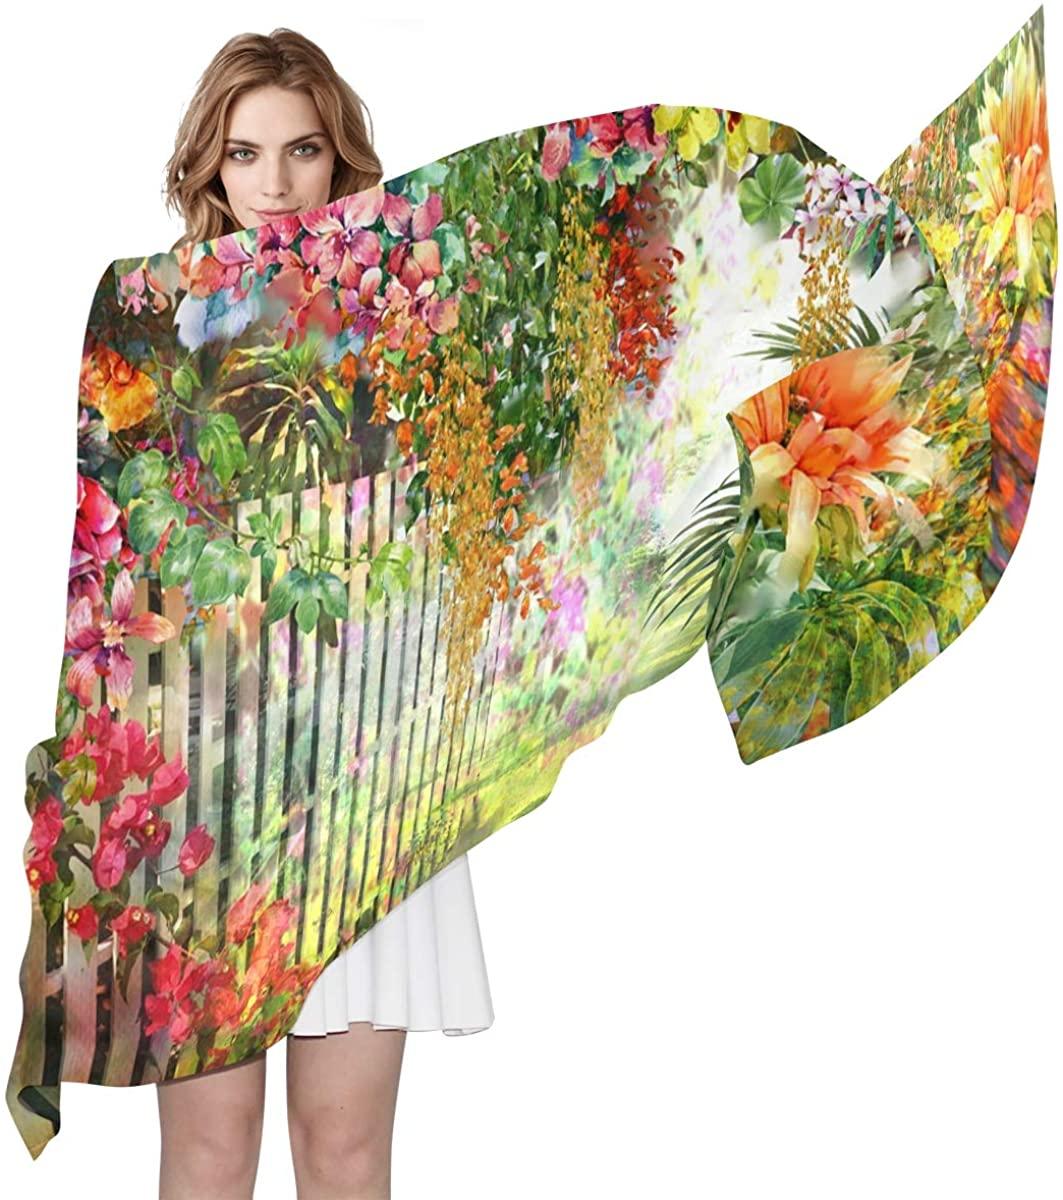 EELa Long Scarf Women Polyester Lightweight Soft Printed Flowers Fashion Wrap Shawl Spring Winter 70x35in